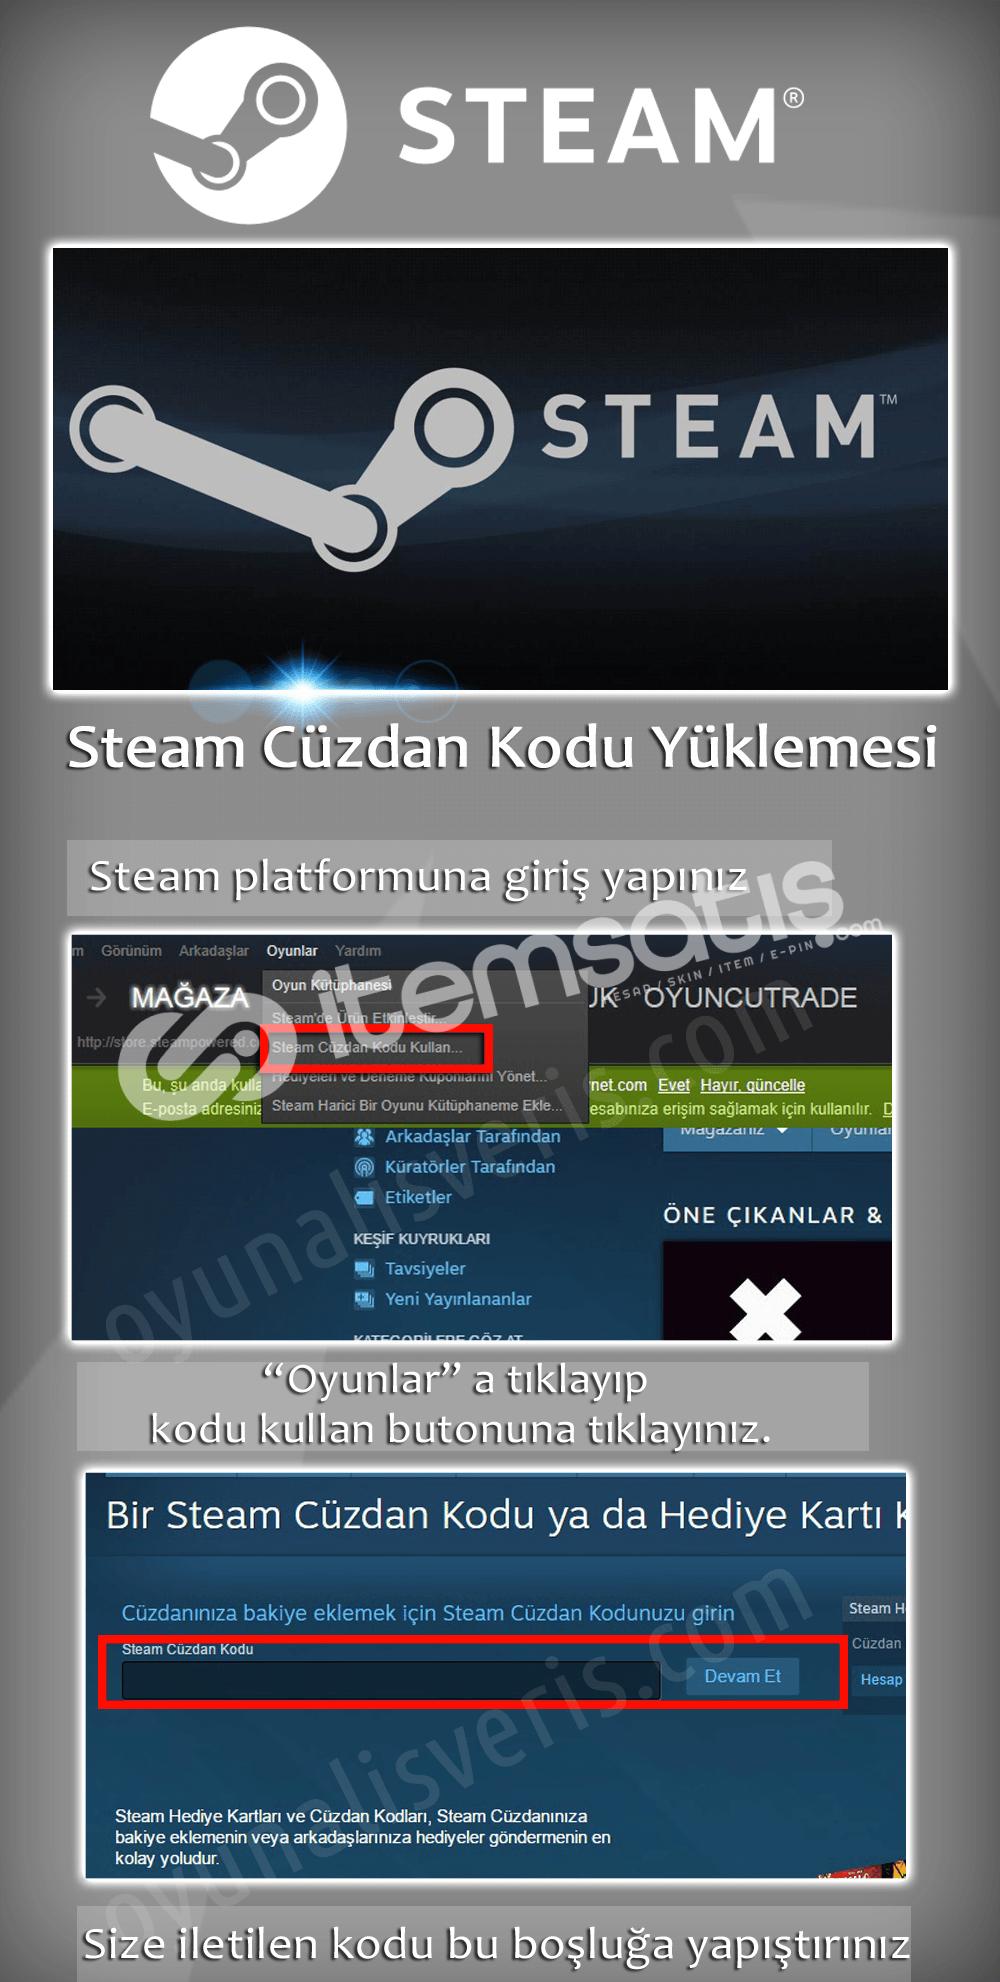 Steam 100 TL kod hemen teslim